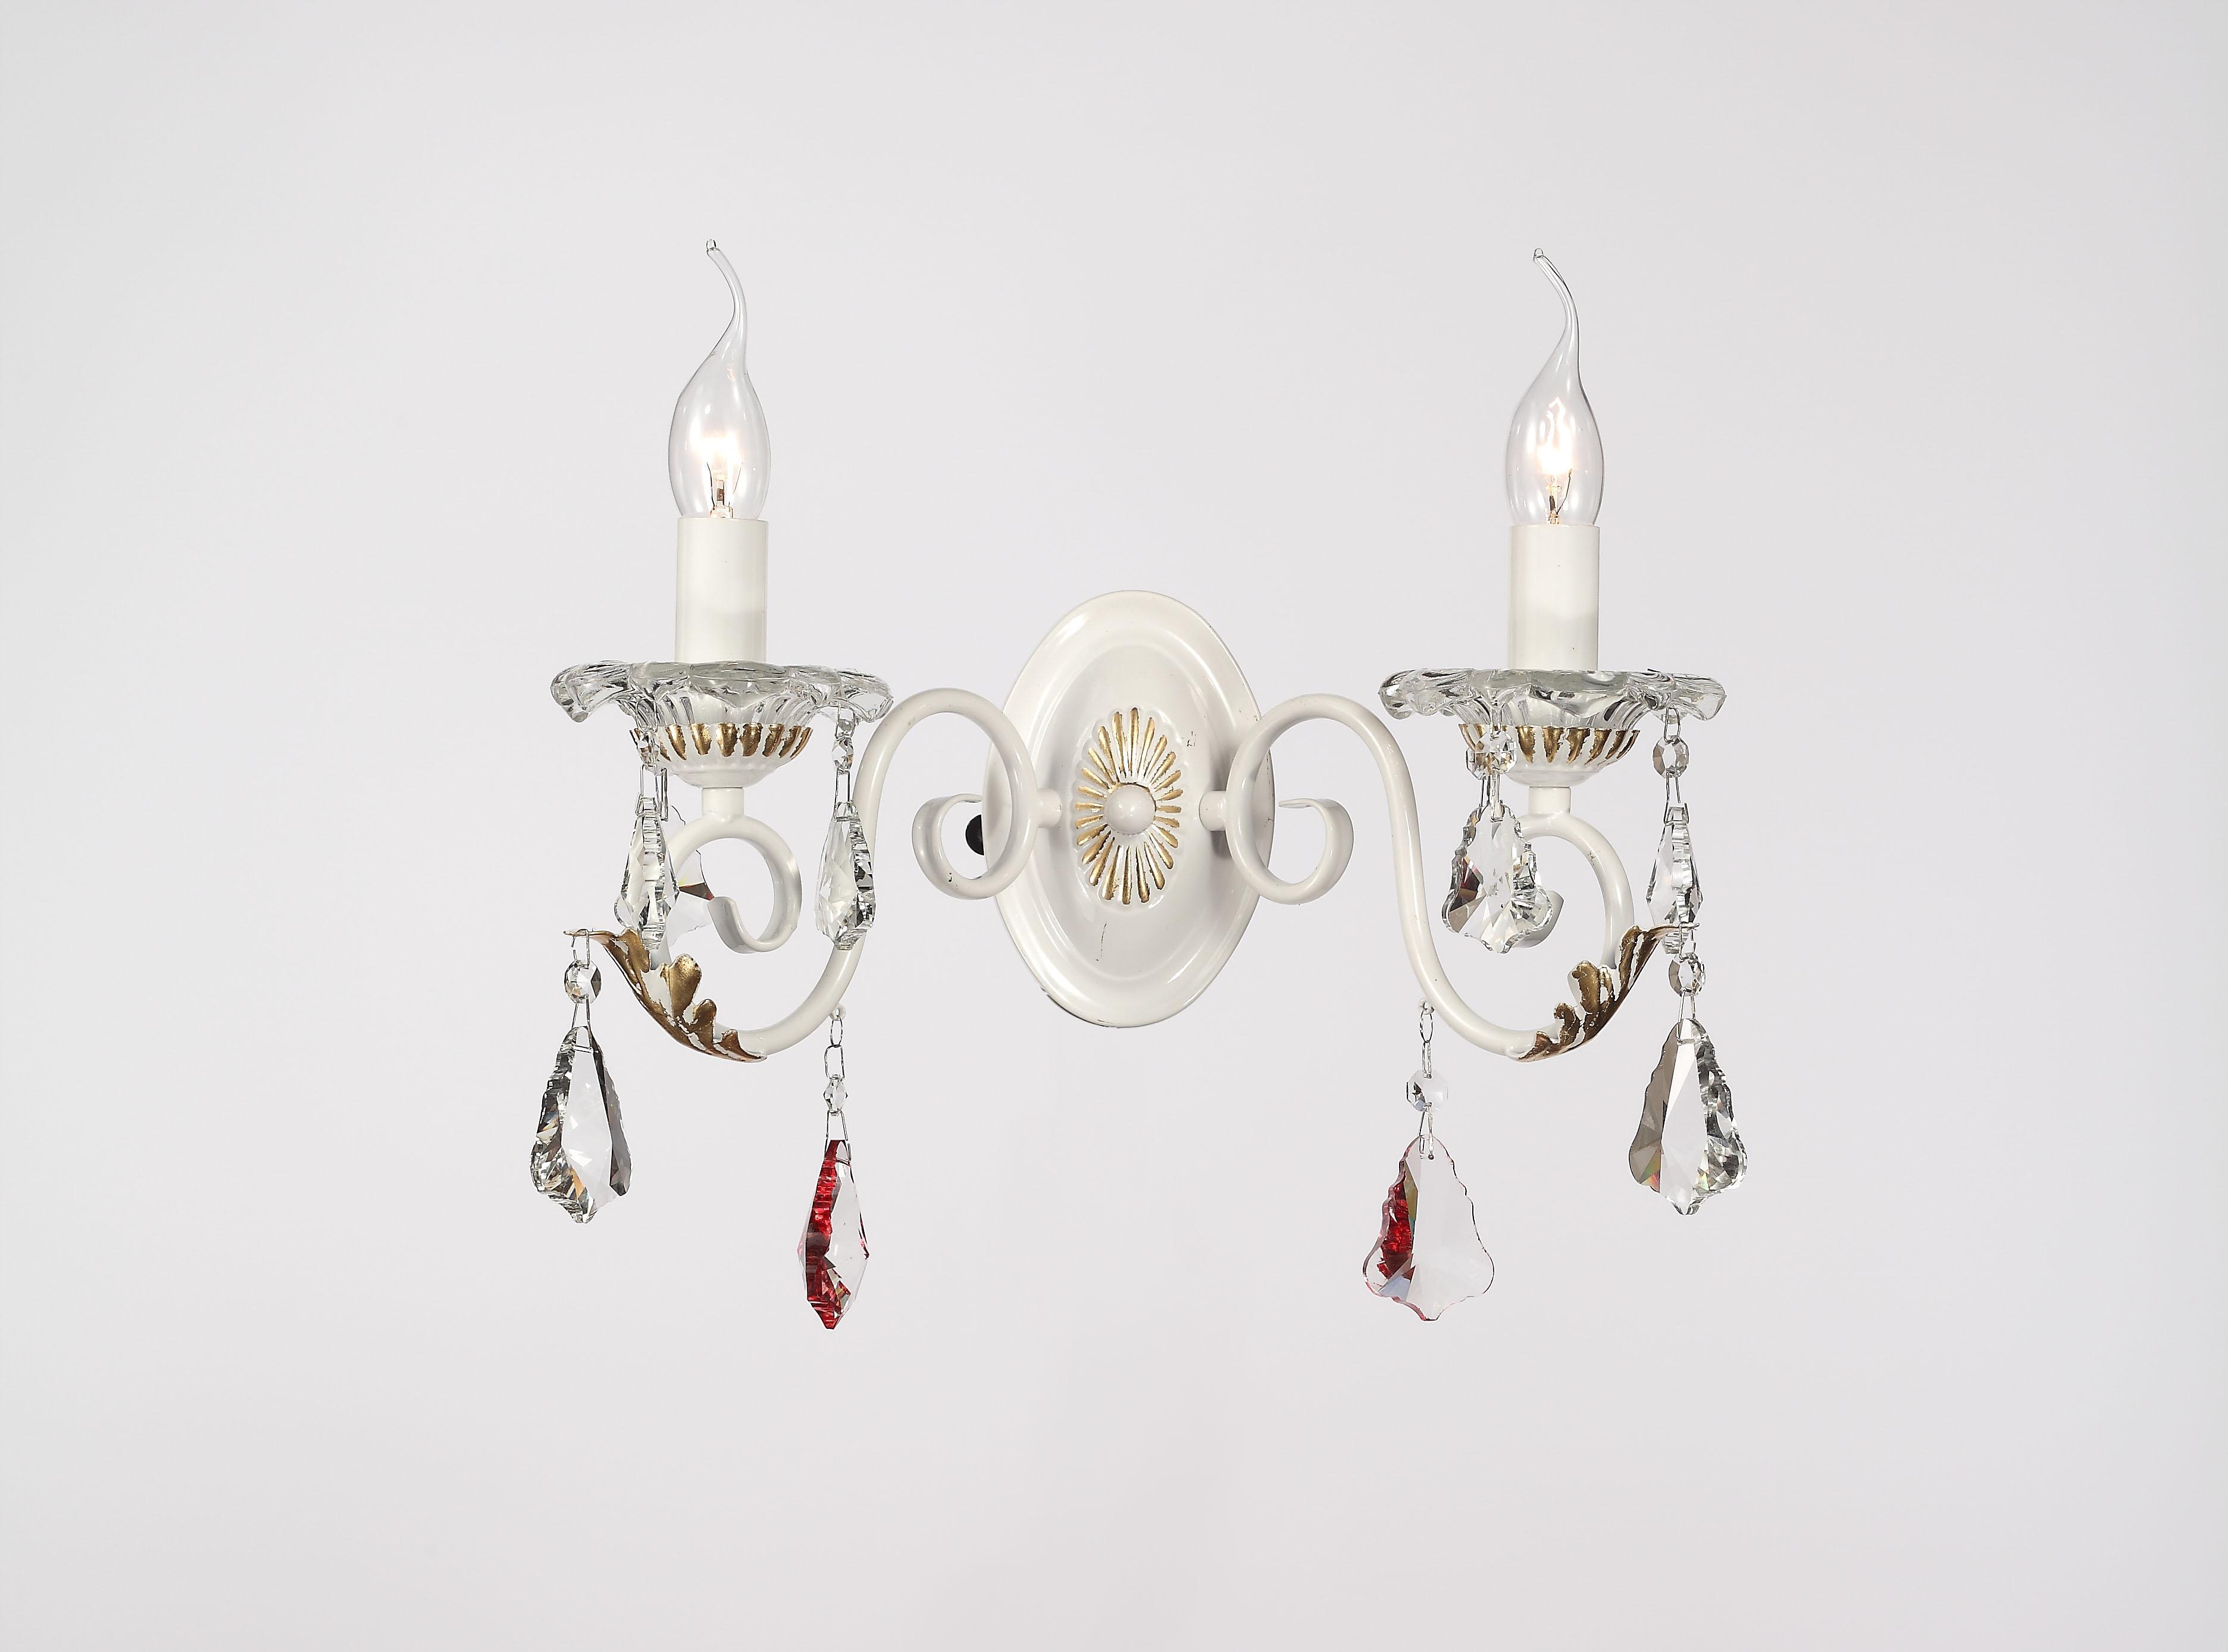 Бра Lamplandia 8952-2 princessa anna люстра lamplandia daria 3х40вт е14 металл темно коричневый